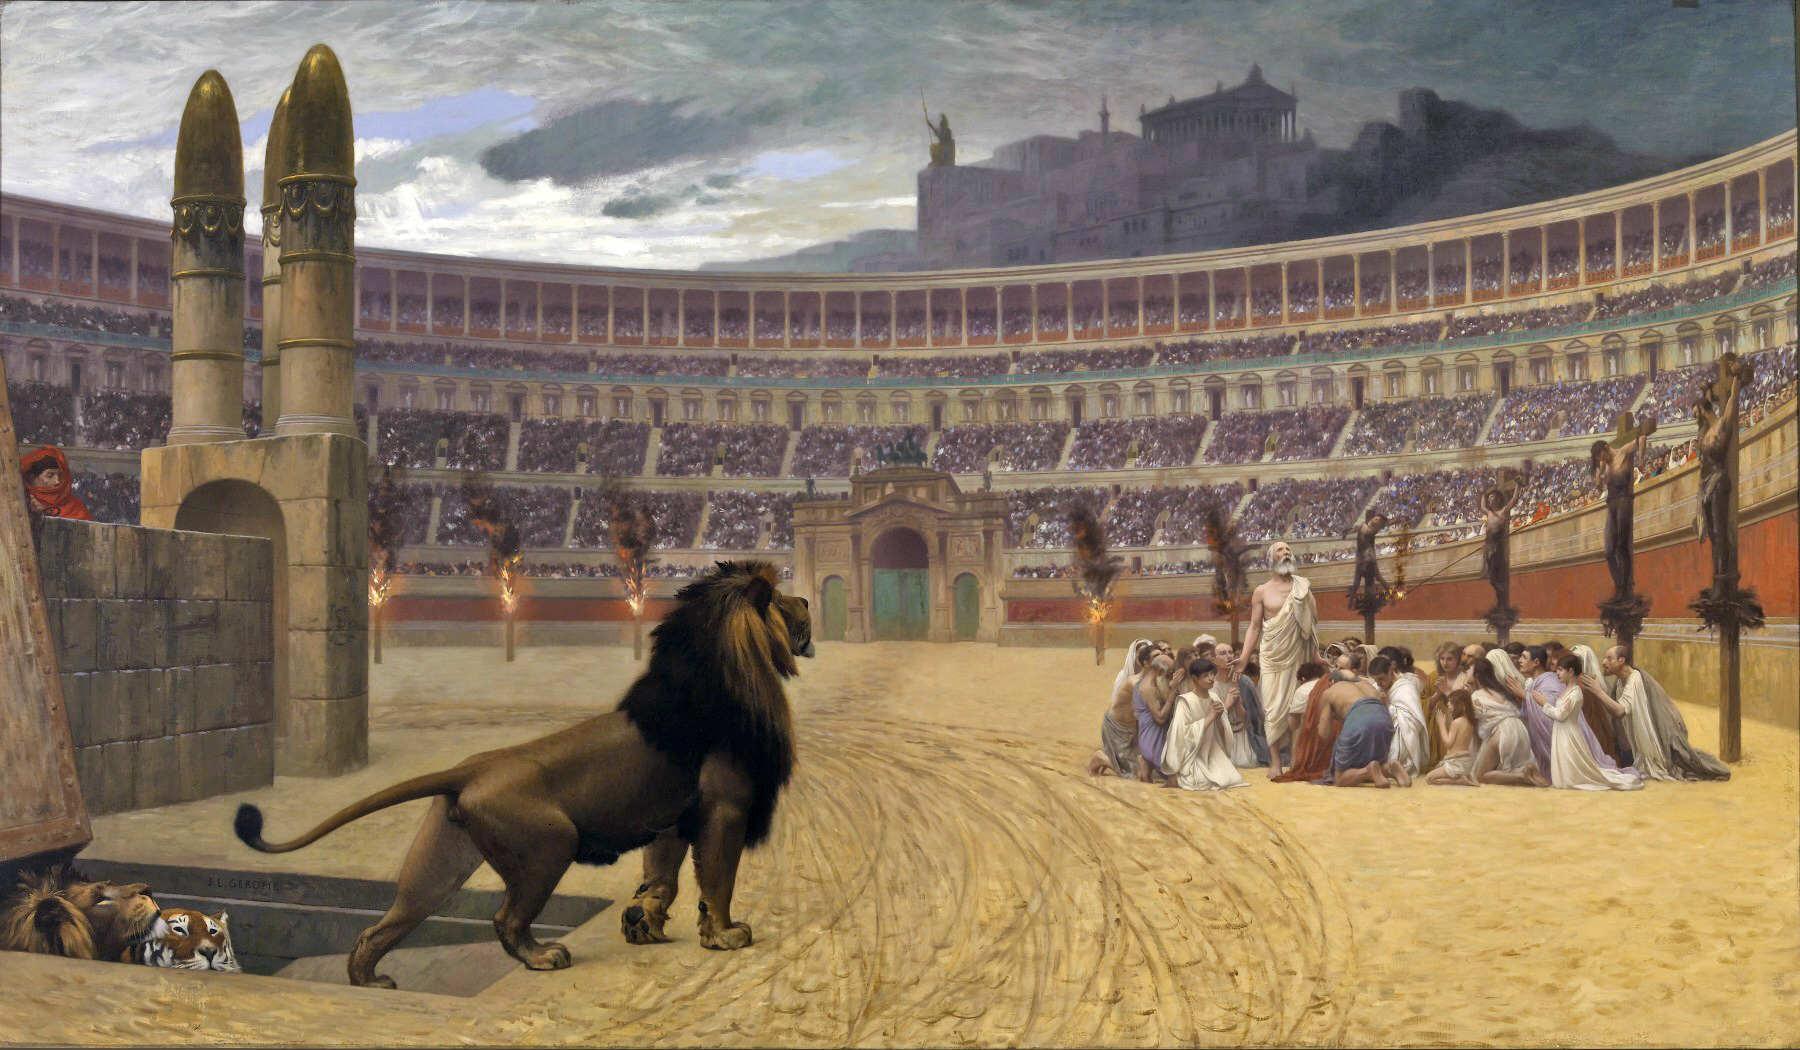 Christians-lions.jpg